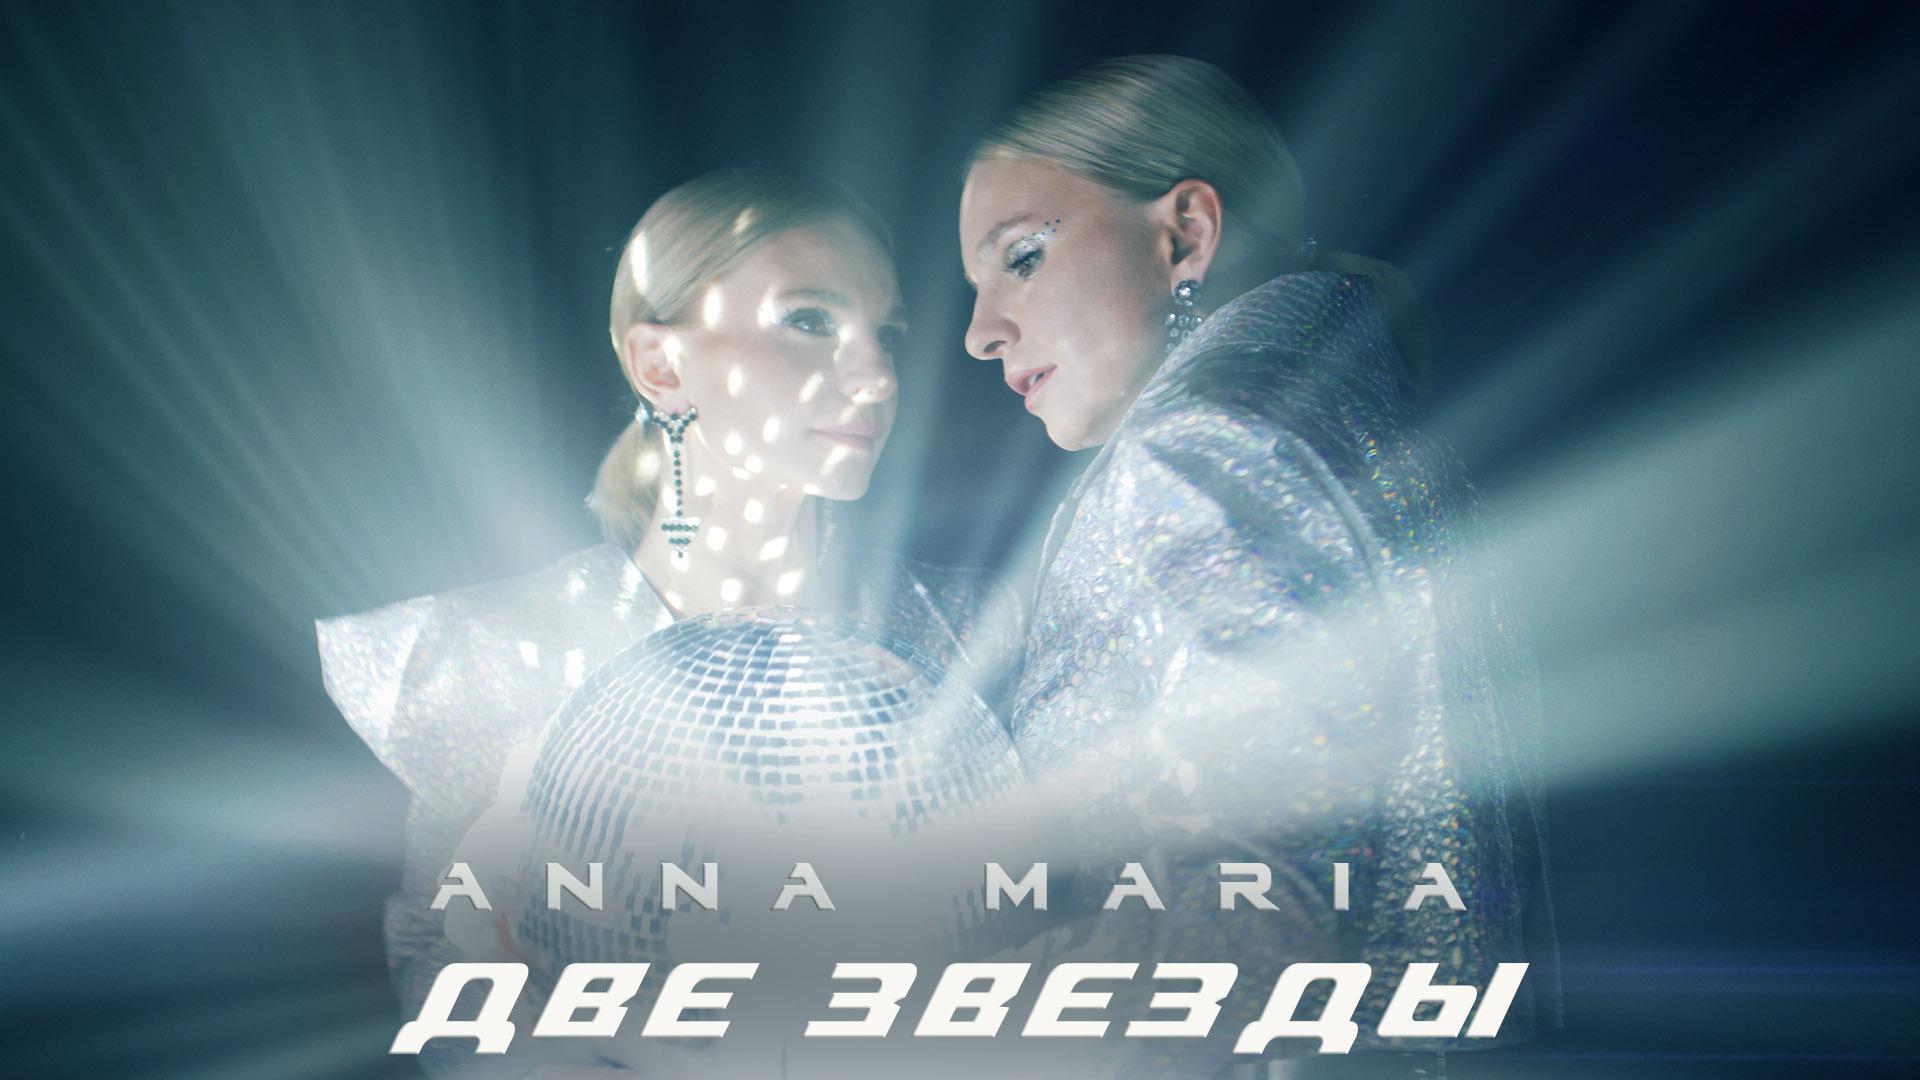 ANNA MARIA - Две звезды